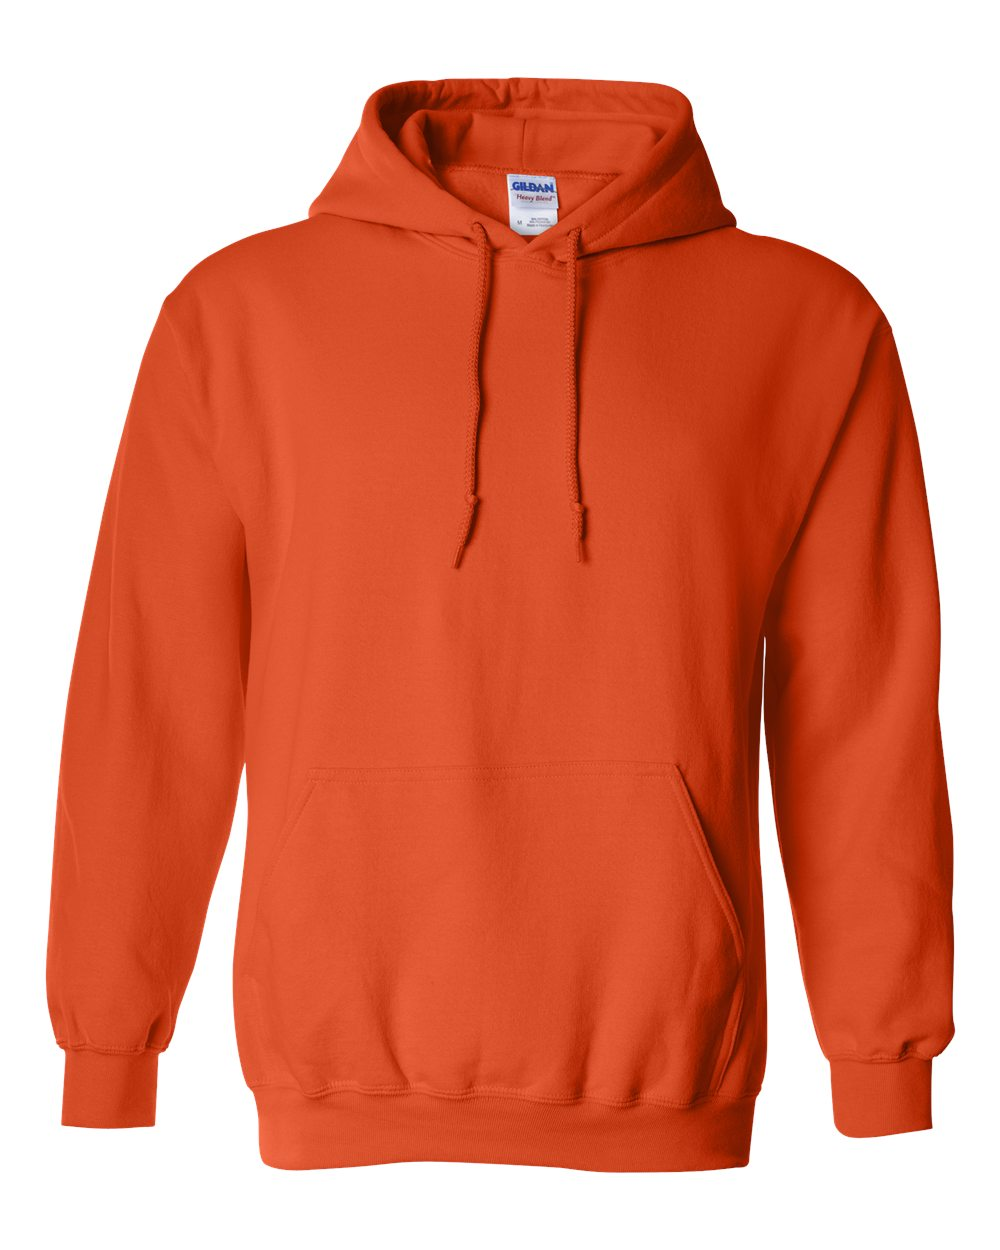 Gildan-Mens-Blank-Hoodie-Heavy-Blend-Hooded-Sweatshirt-18500-up-to-5XL thumbnail 36